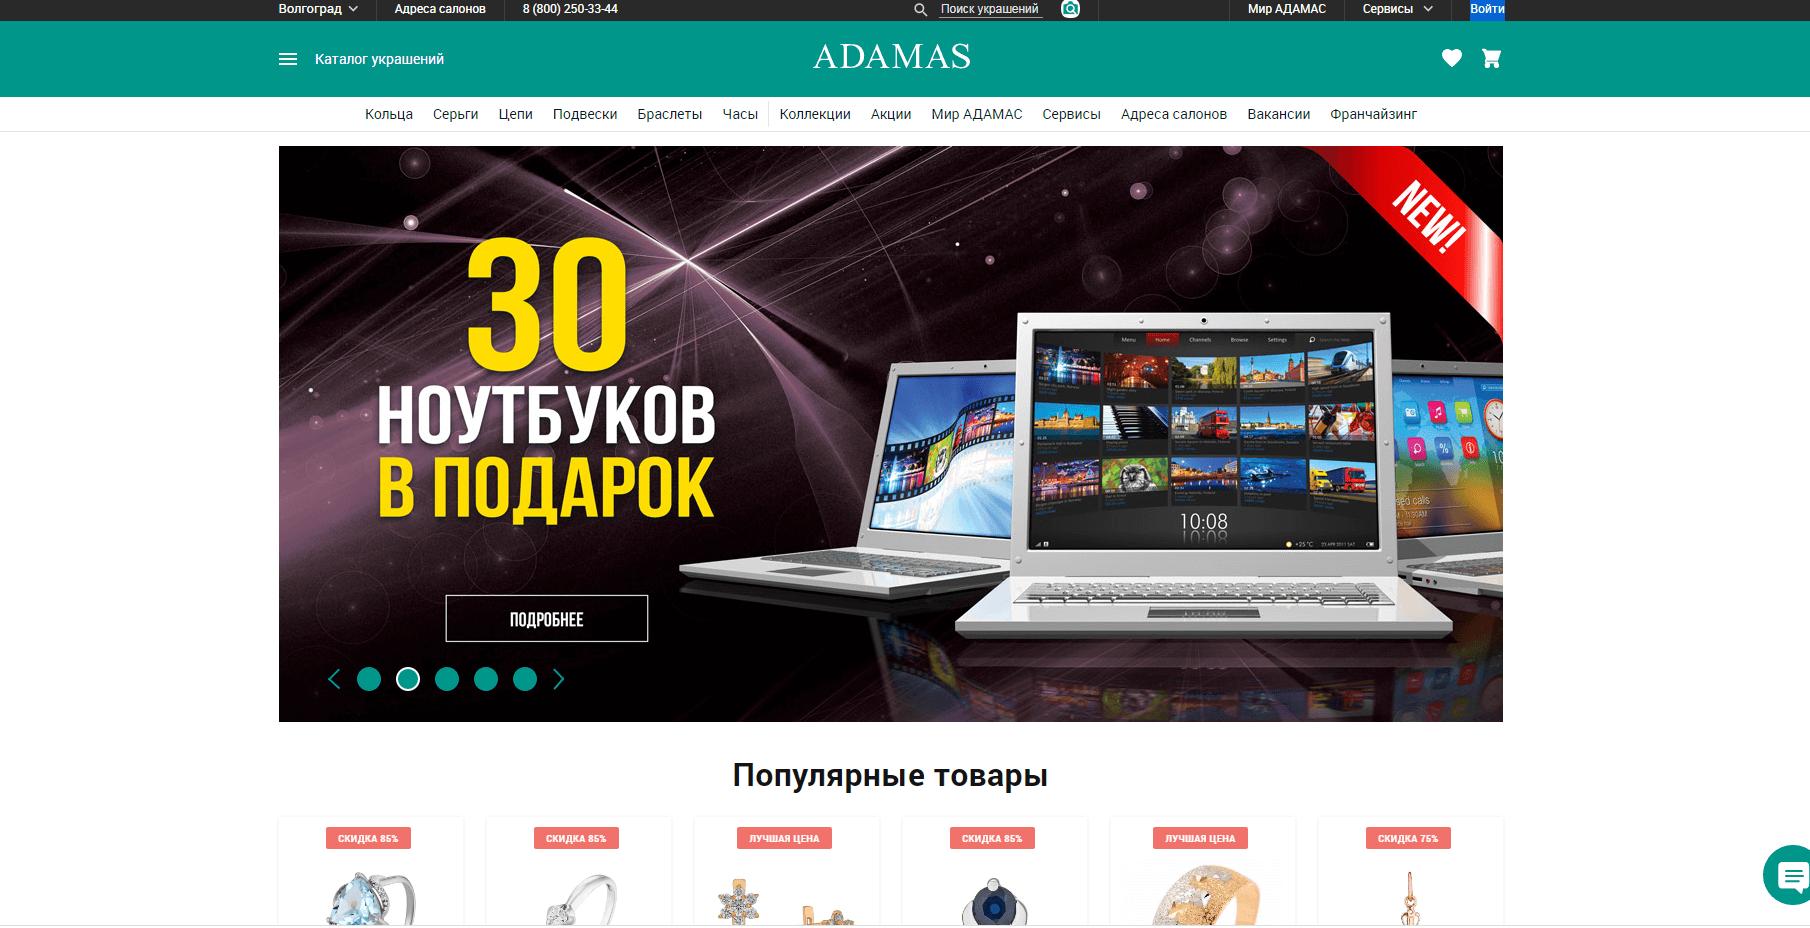 adamas.ru website